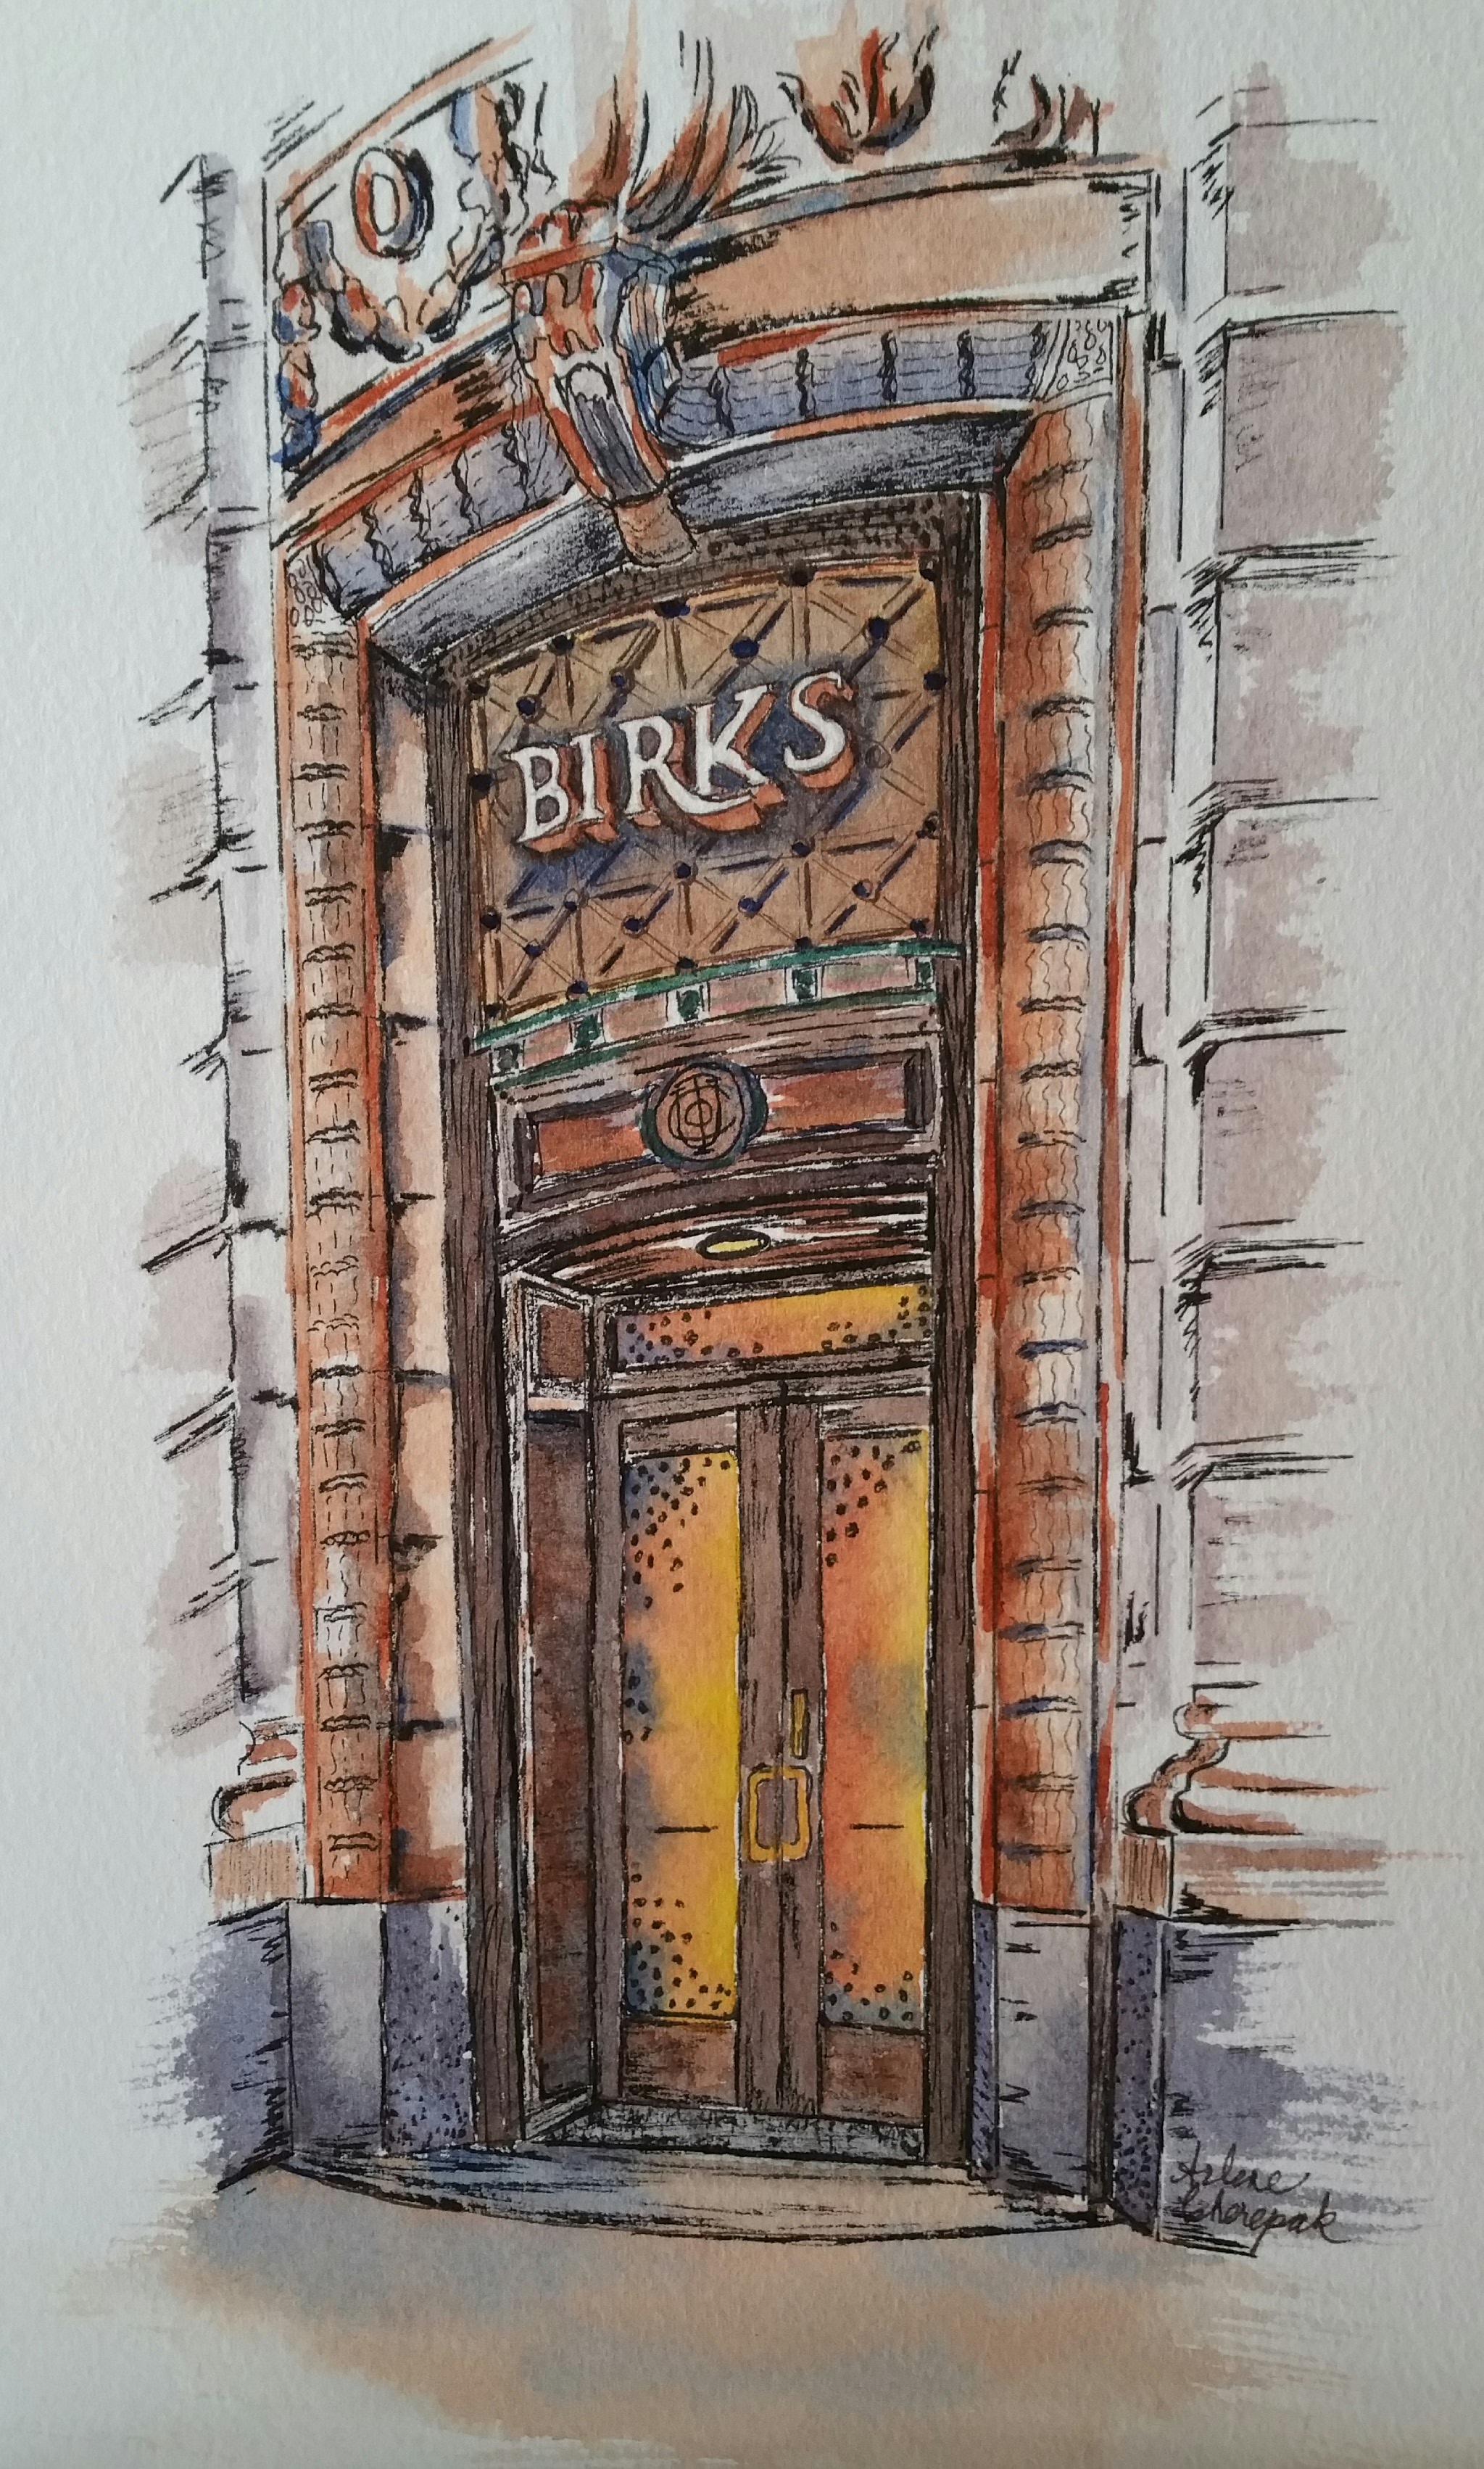 Birks Jewelry Store